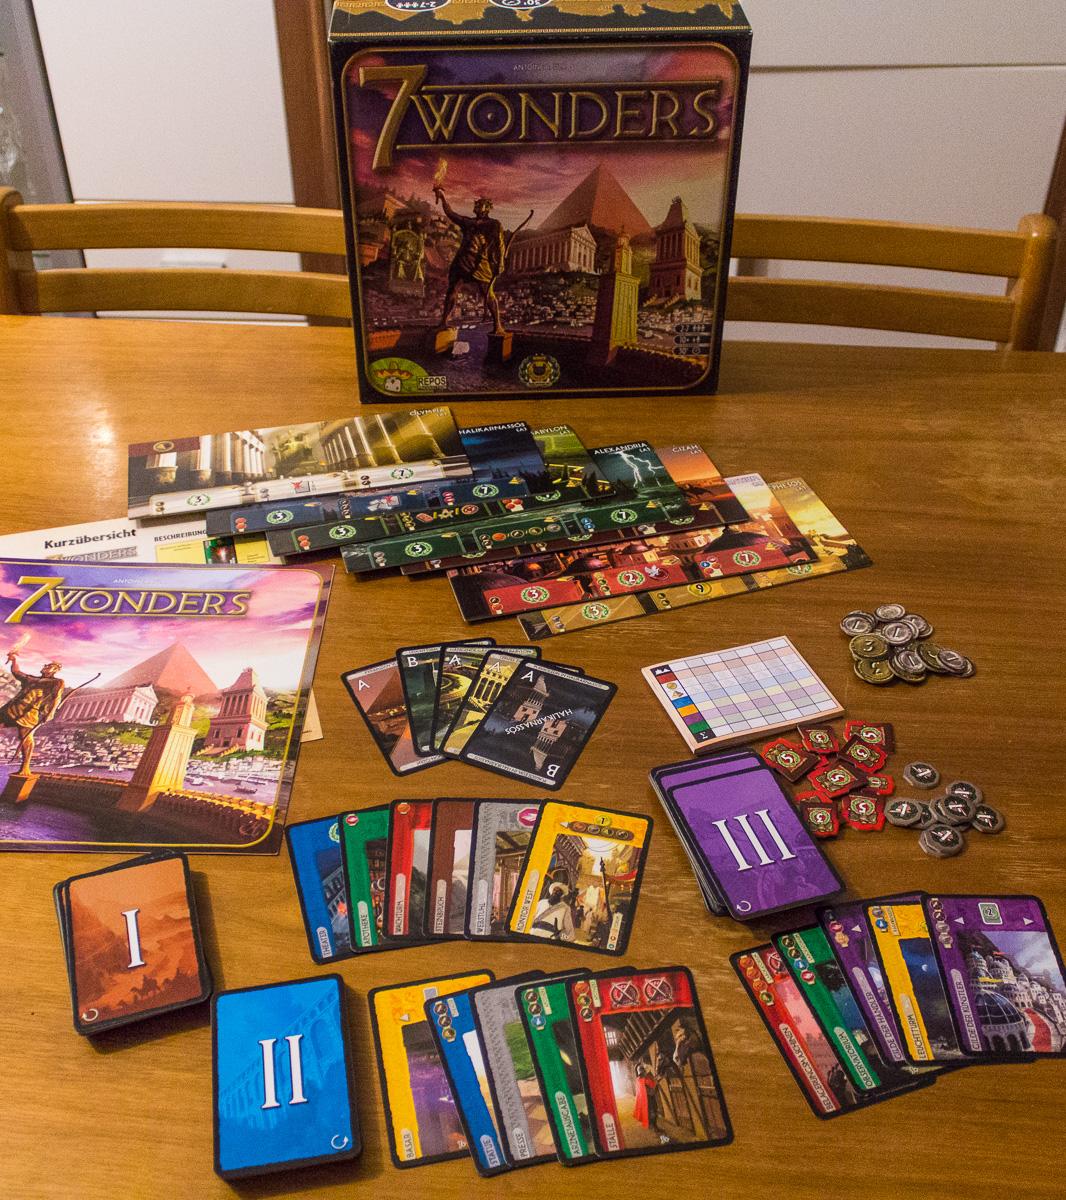 7 wonders spiel